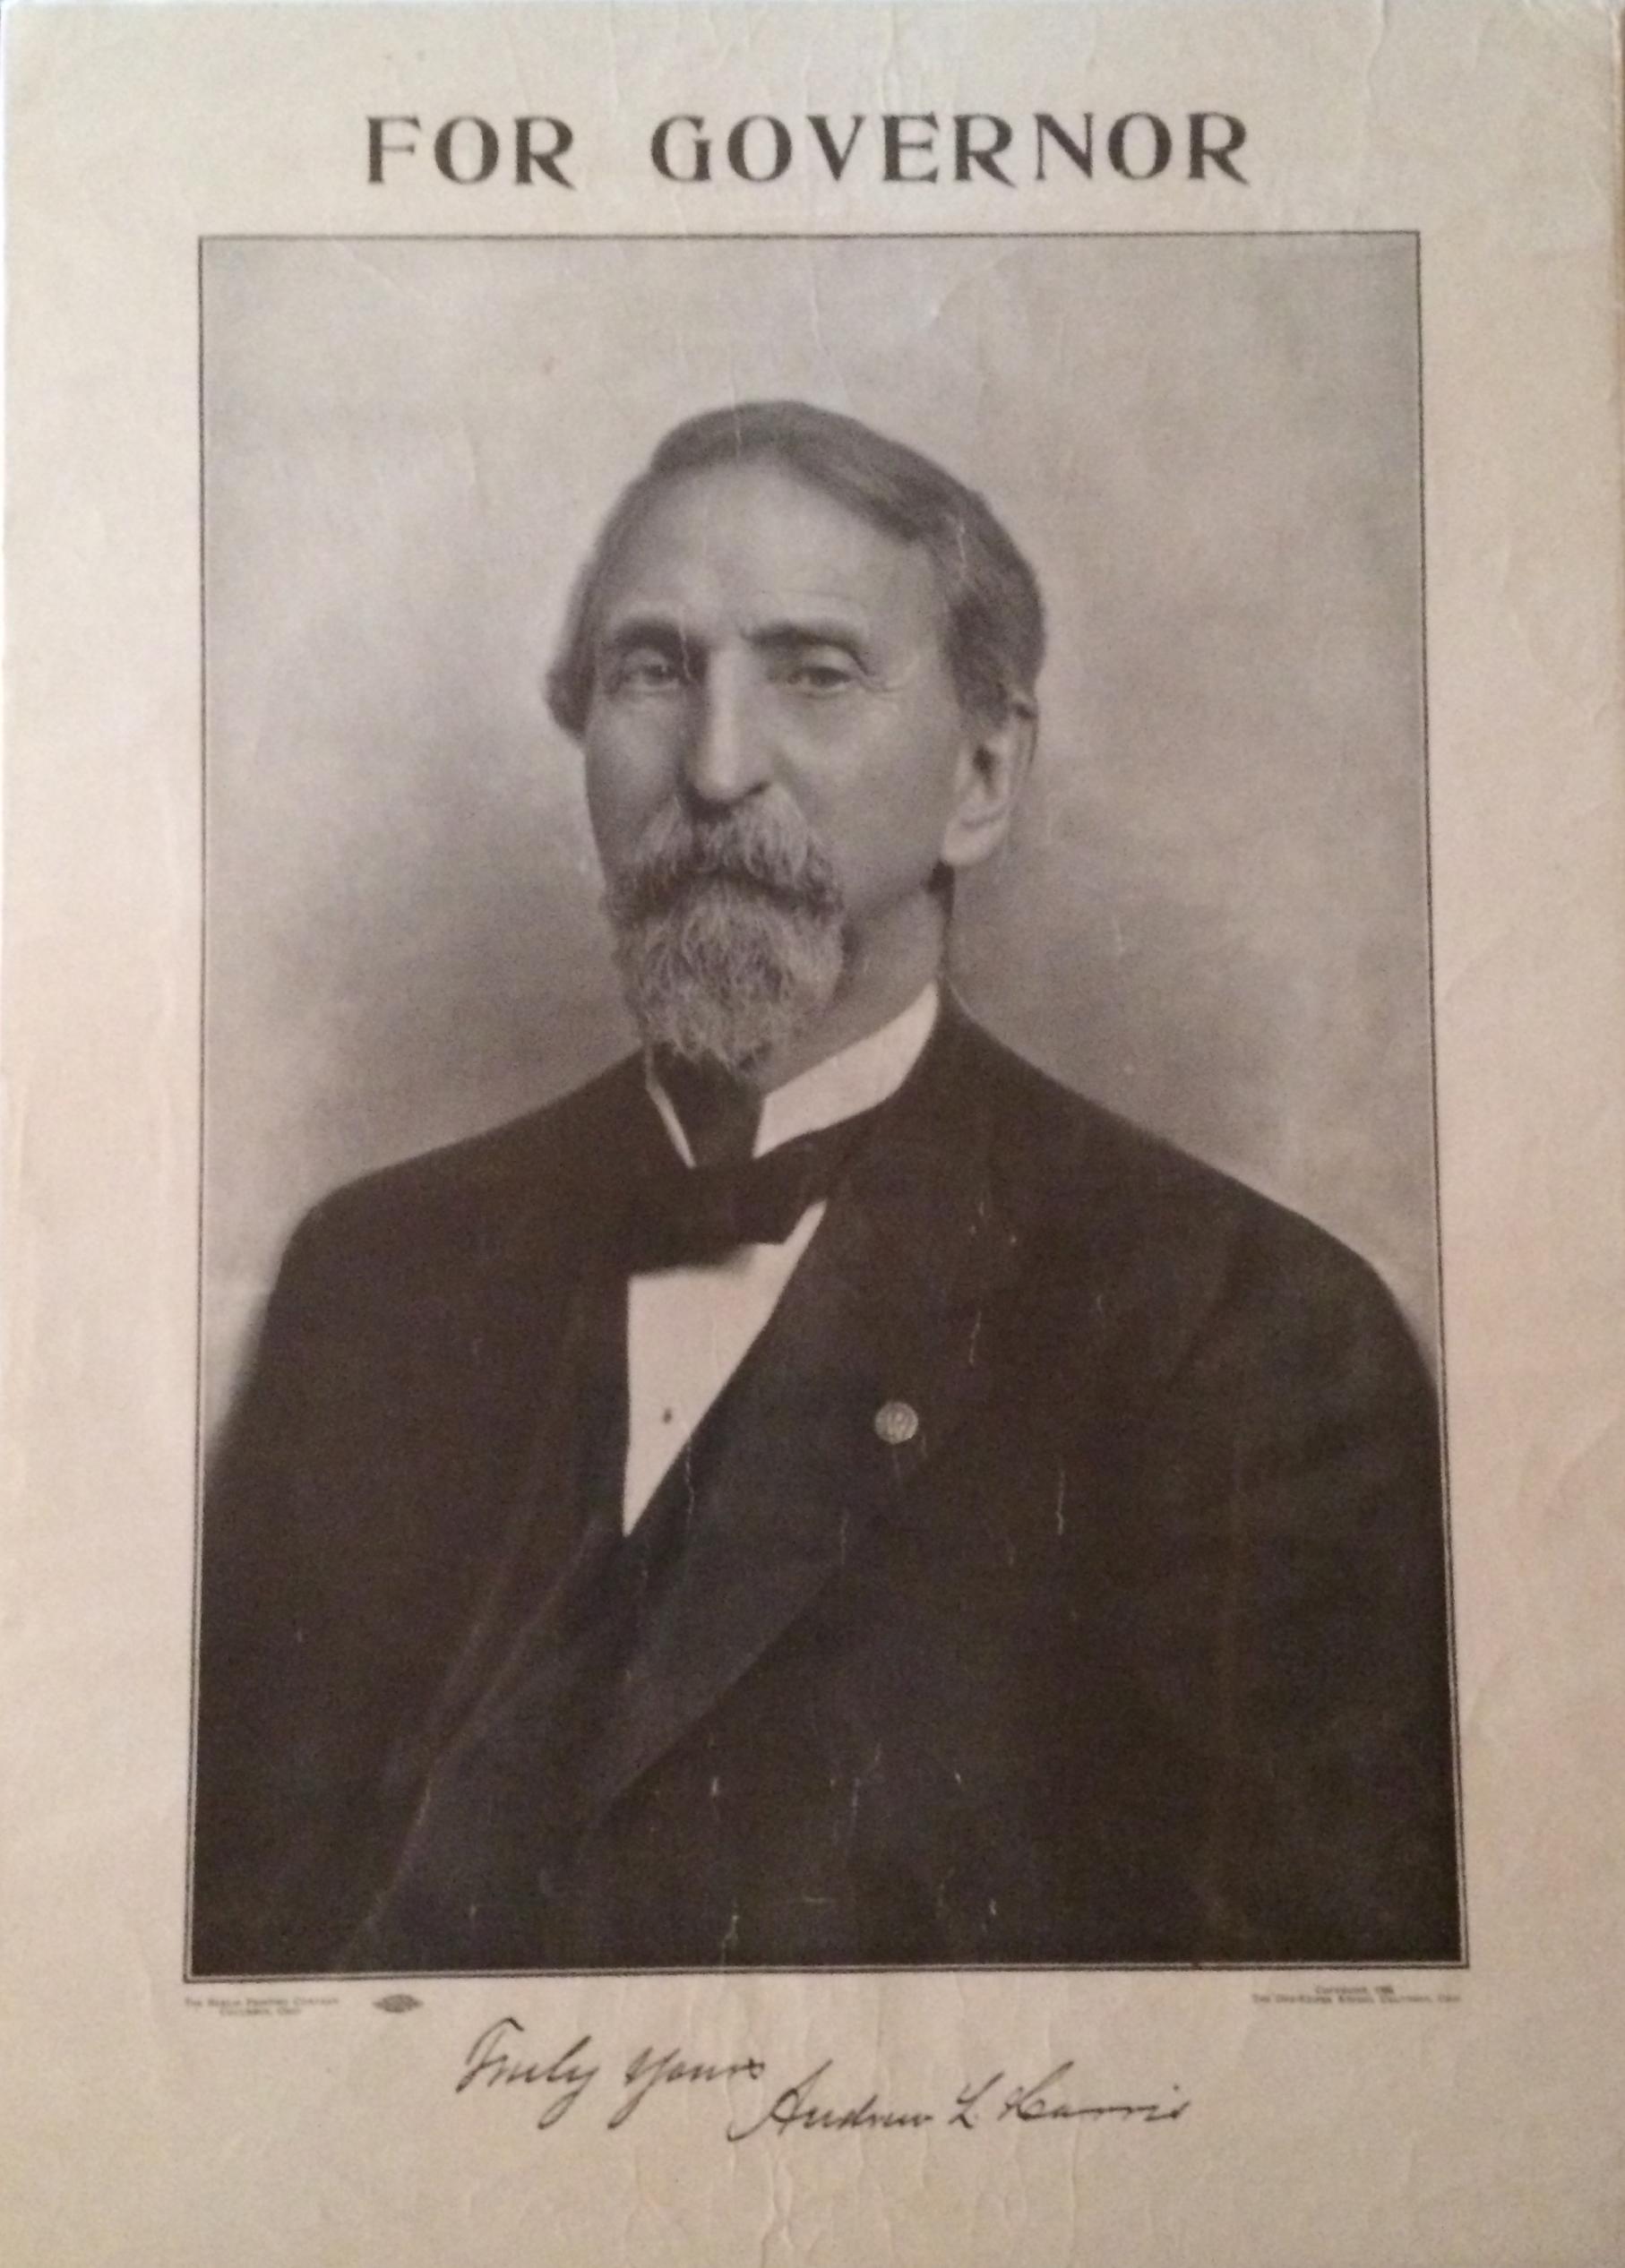 Poster OH-1908 HARRIS.jpg